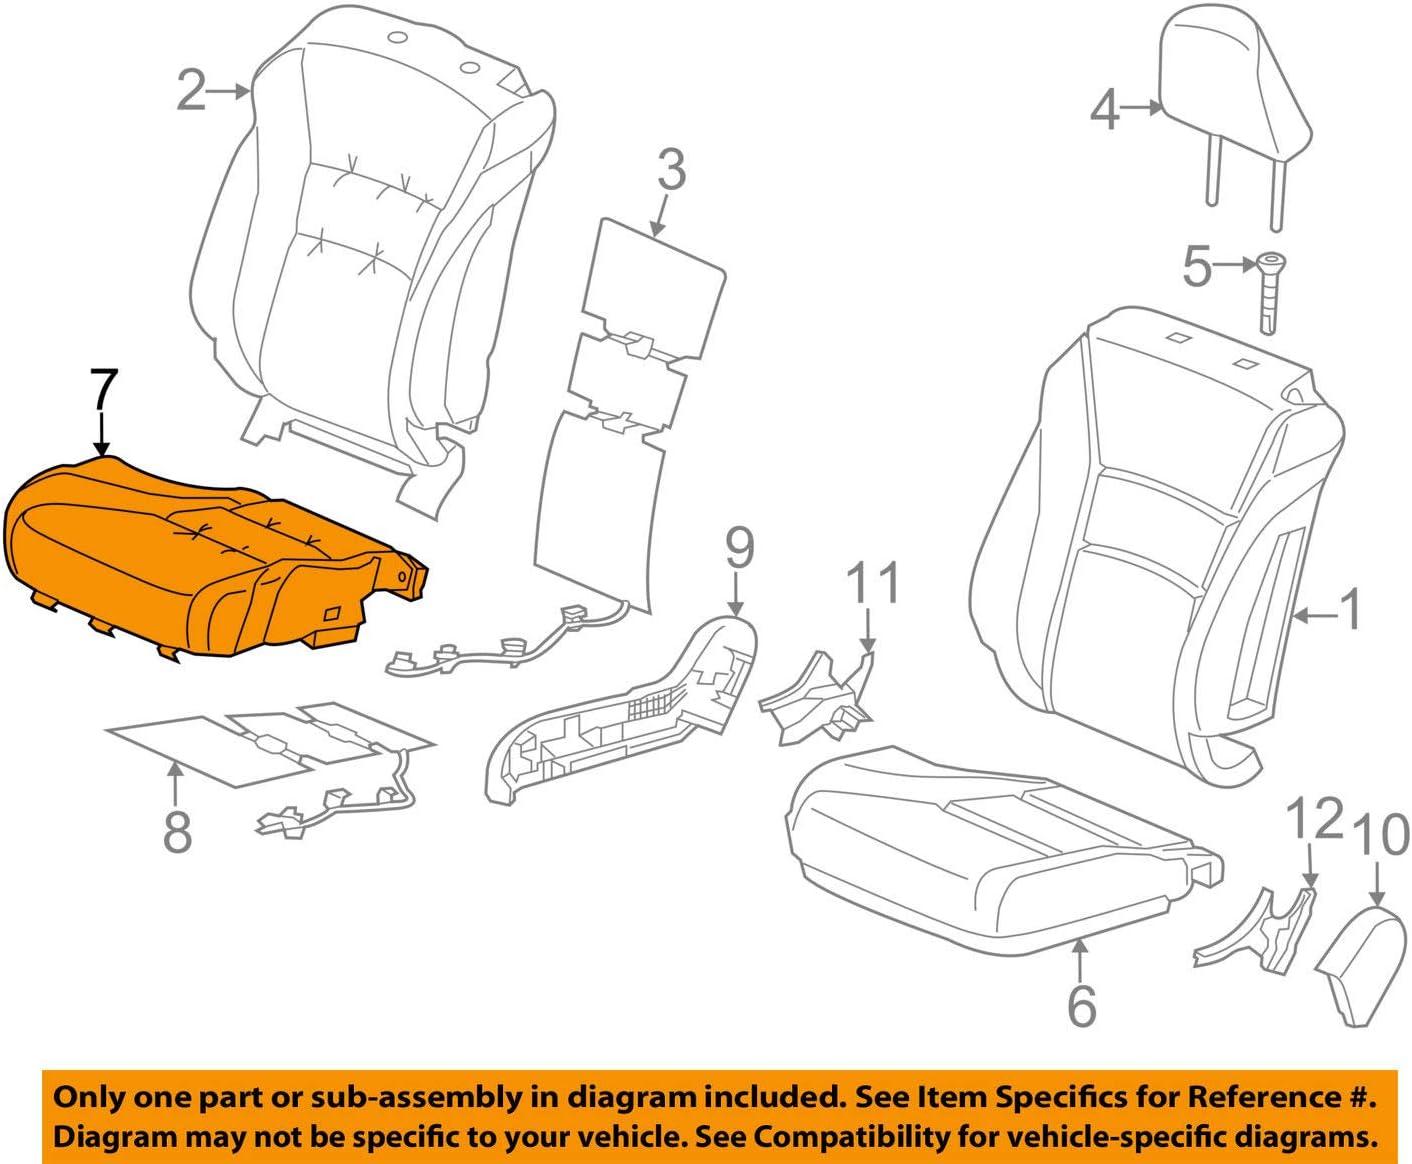 Honda Genuine 81131-T3L-A41ZA Seat Cushion Cover Right Fr Trim Cheap Overseas parallel import regular item SALE Start